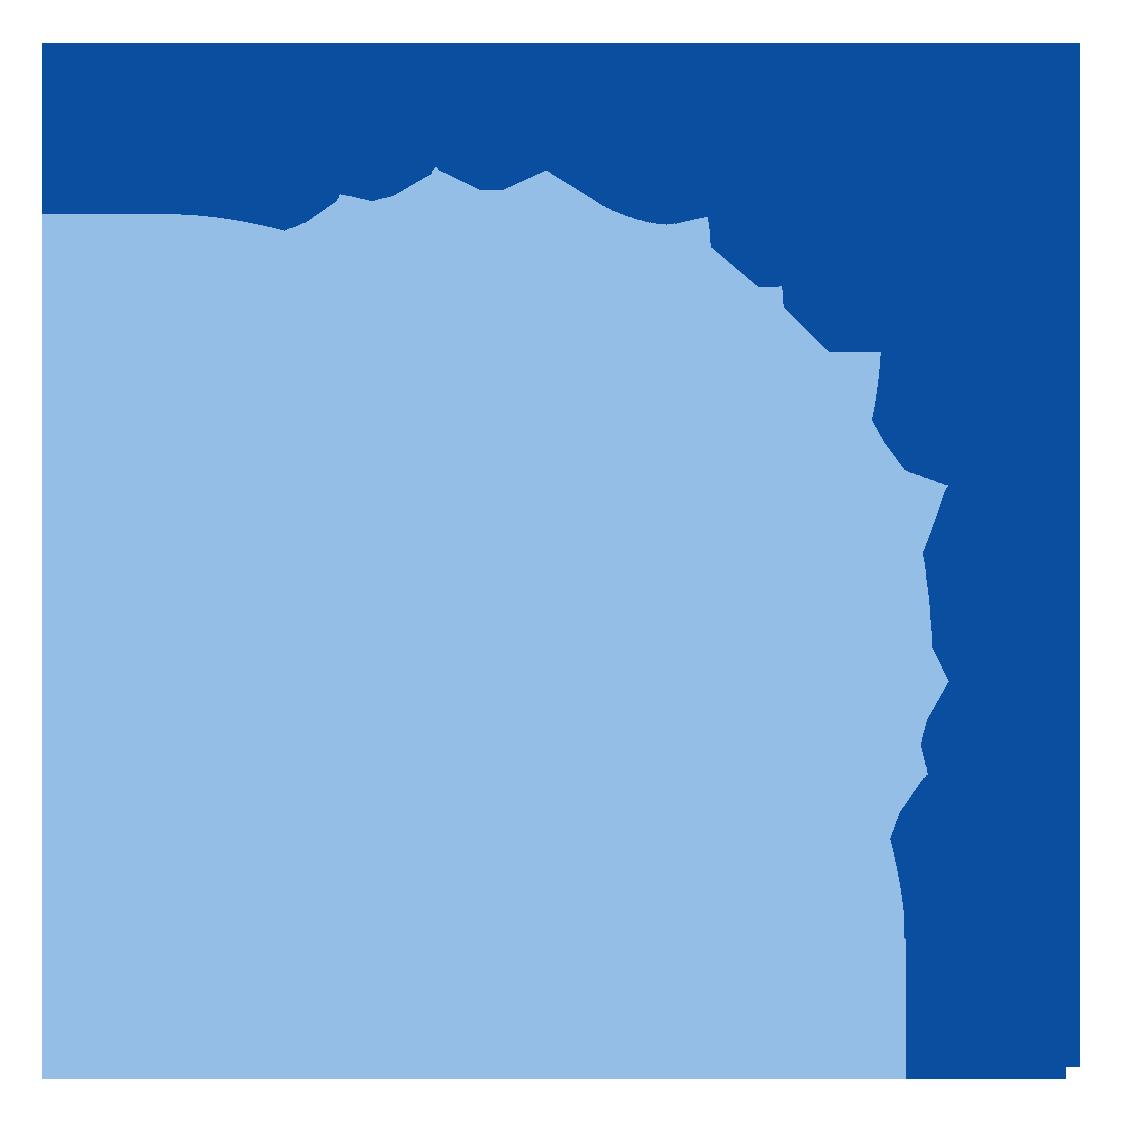 Nishtex - Textile Products